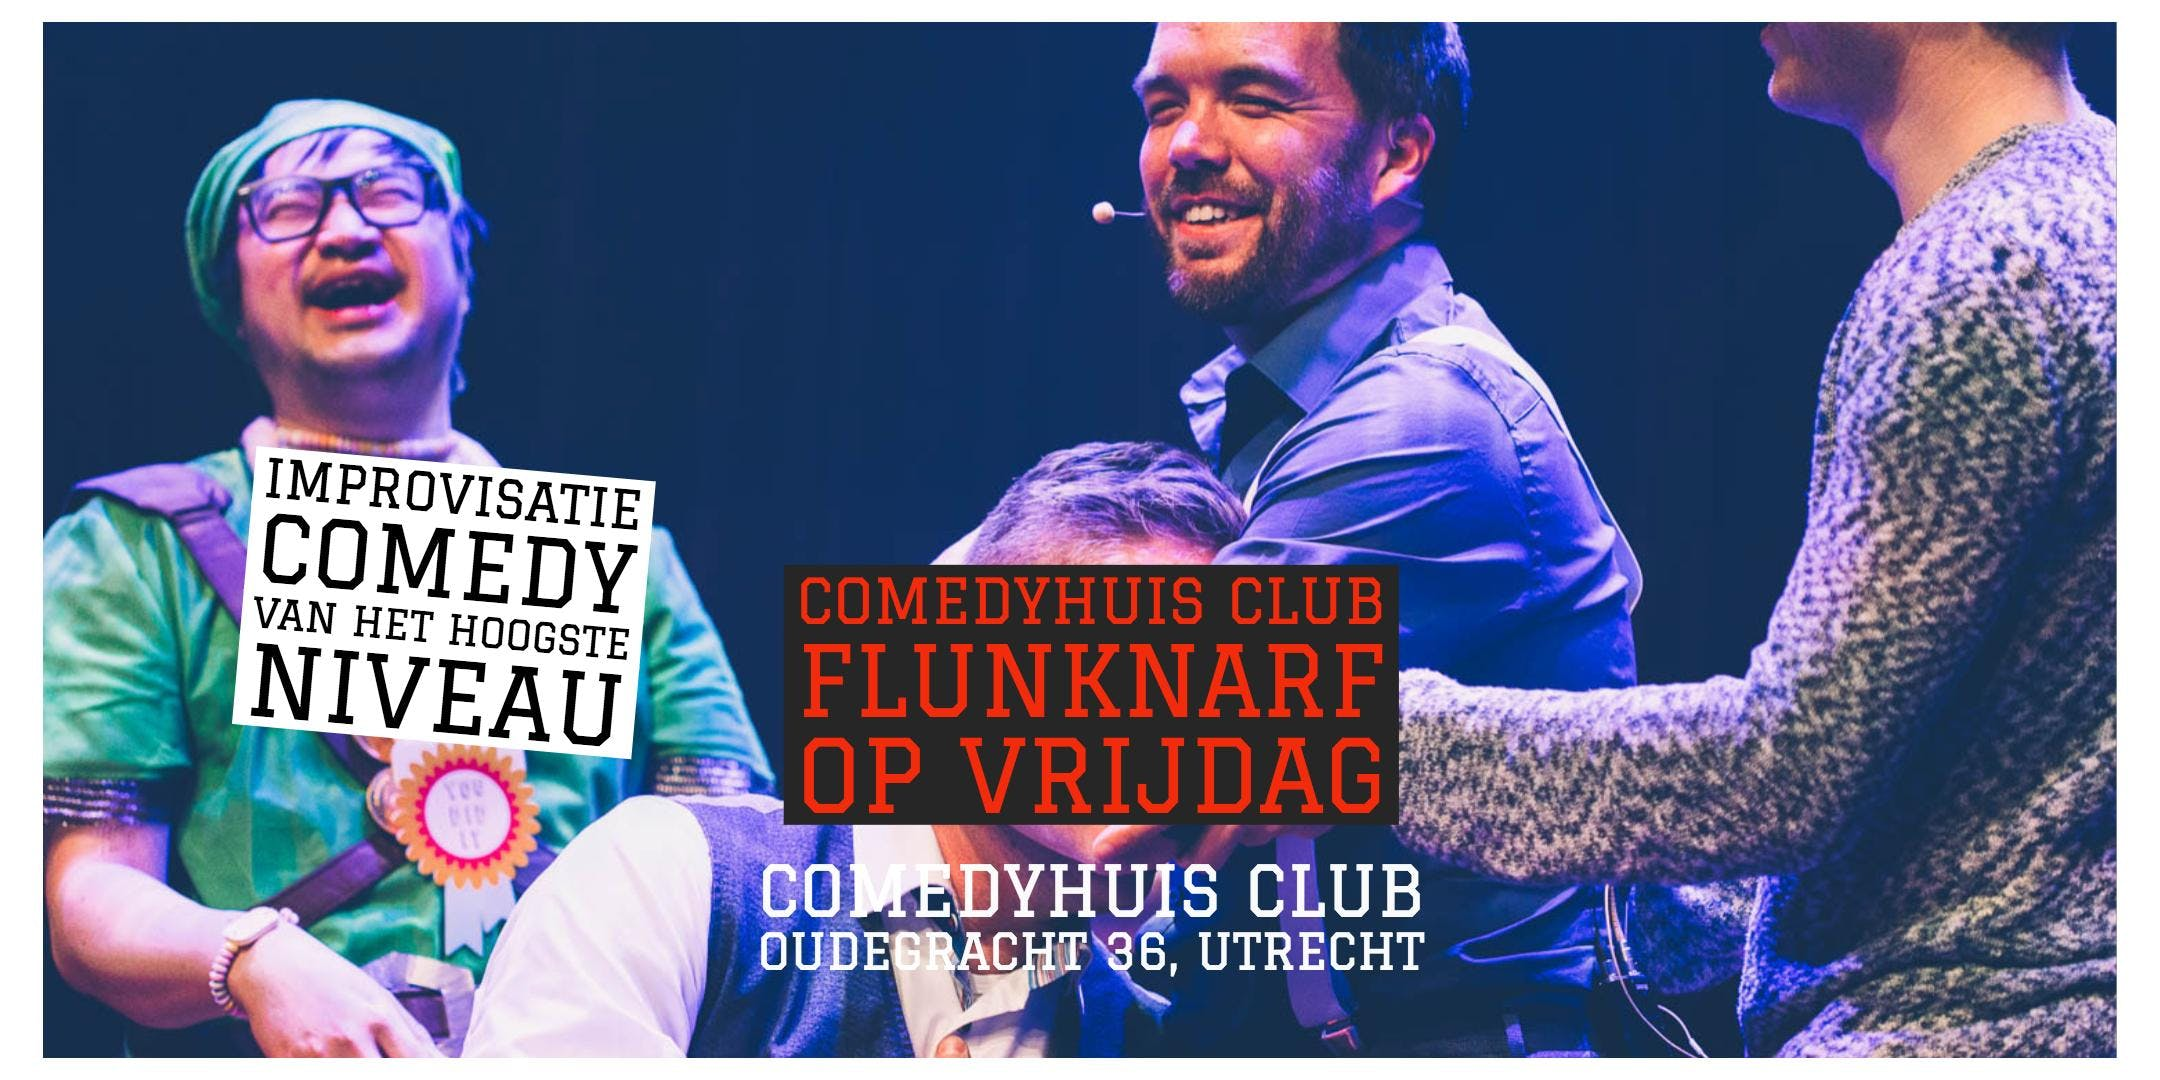 Comedyhuis Club: Flunknarf op vrijdag